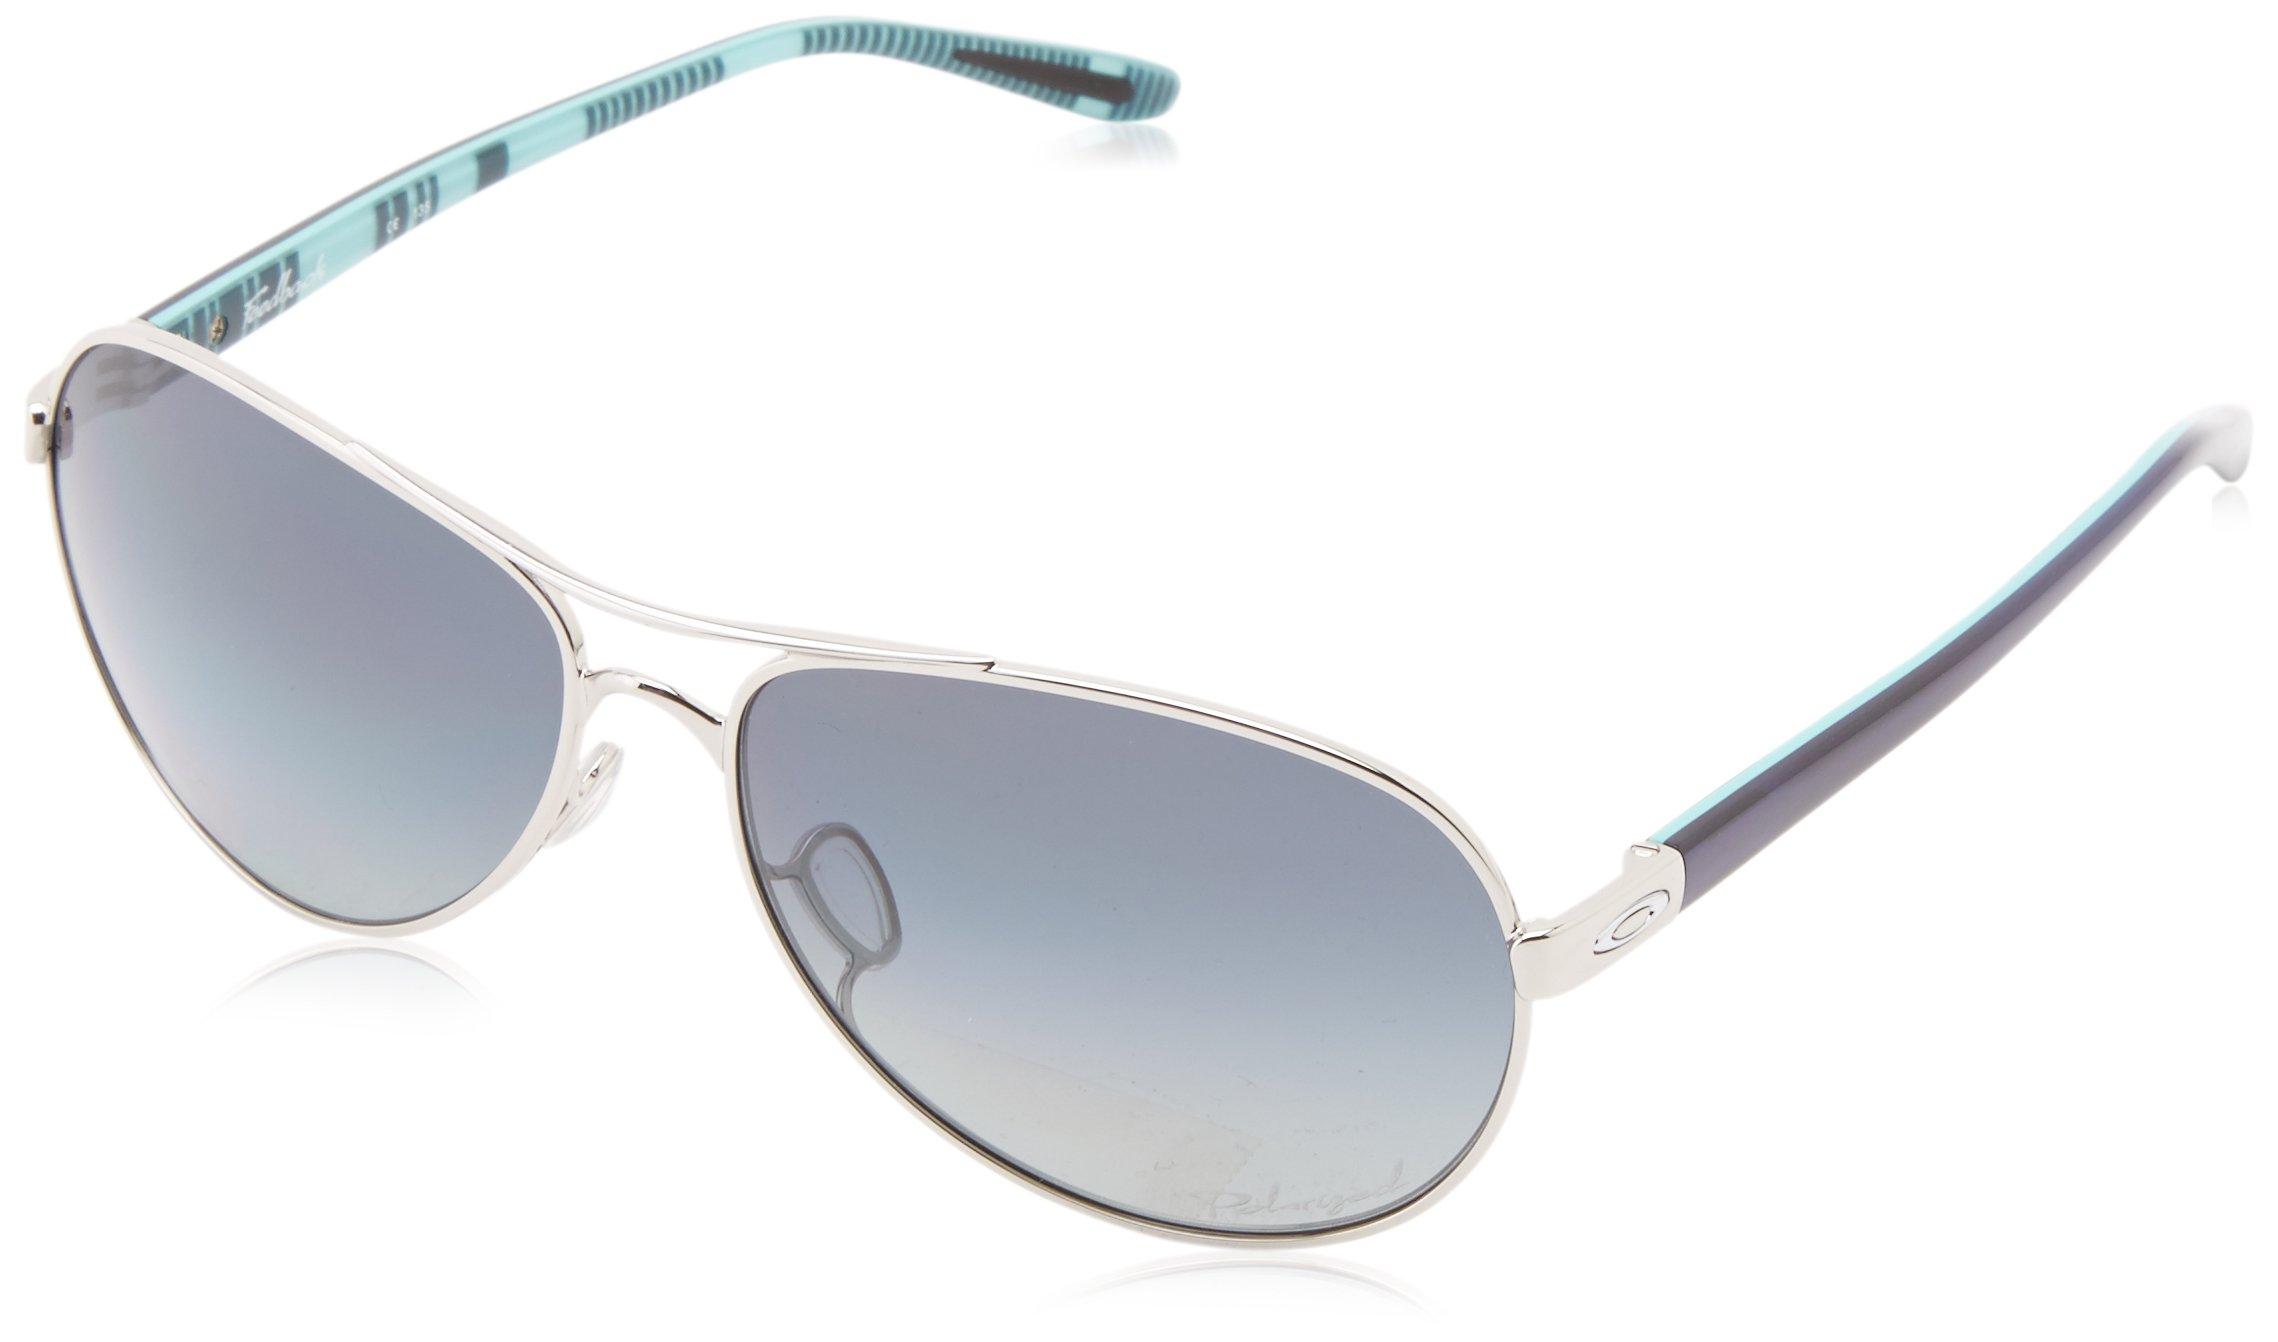 Oakley Feedback Polarized Aviator Sunglasses,Polished Chrome,59 mm